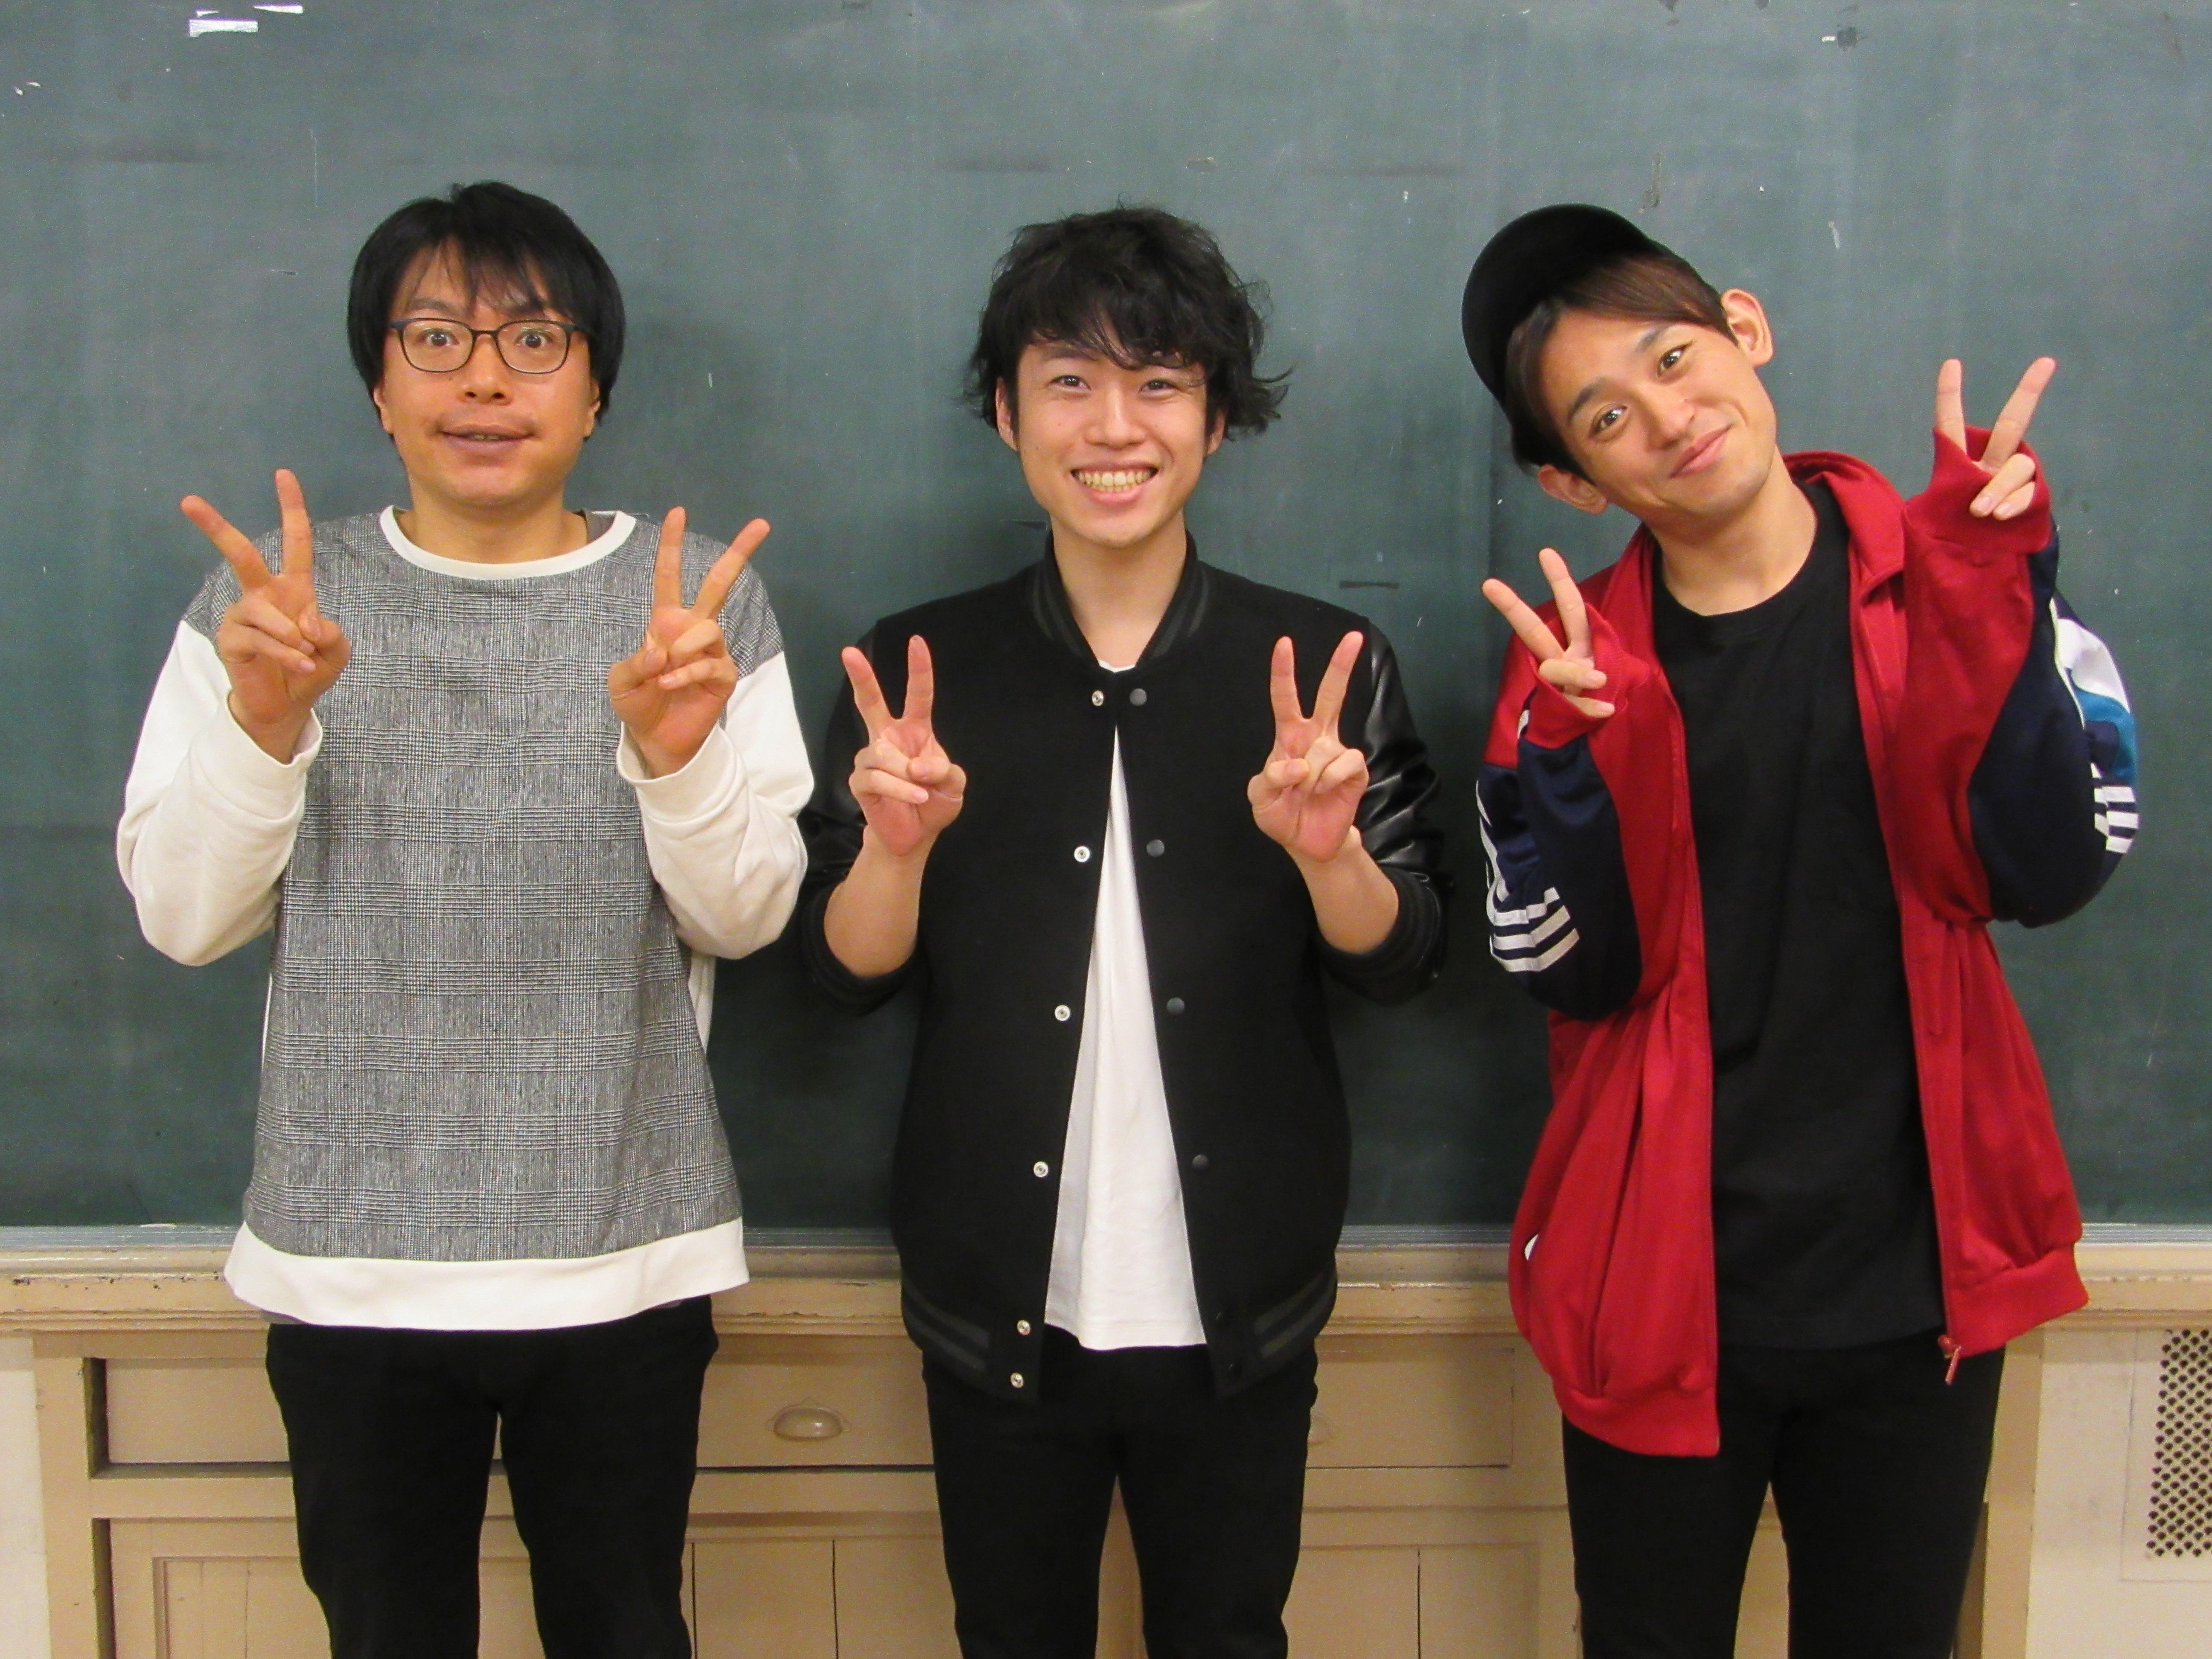 http://news.yoshimoto.co.jp/20181113010831-09117ecc6ee9879089d41a569bfc6860d758ff98.jpg